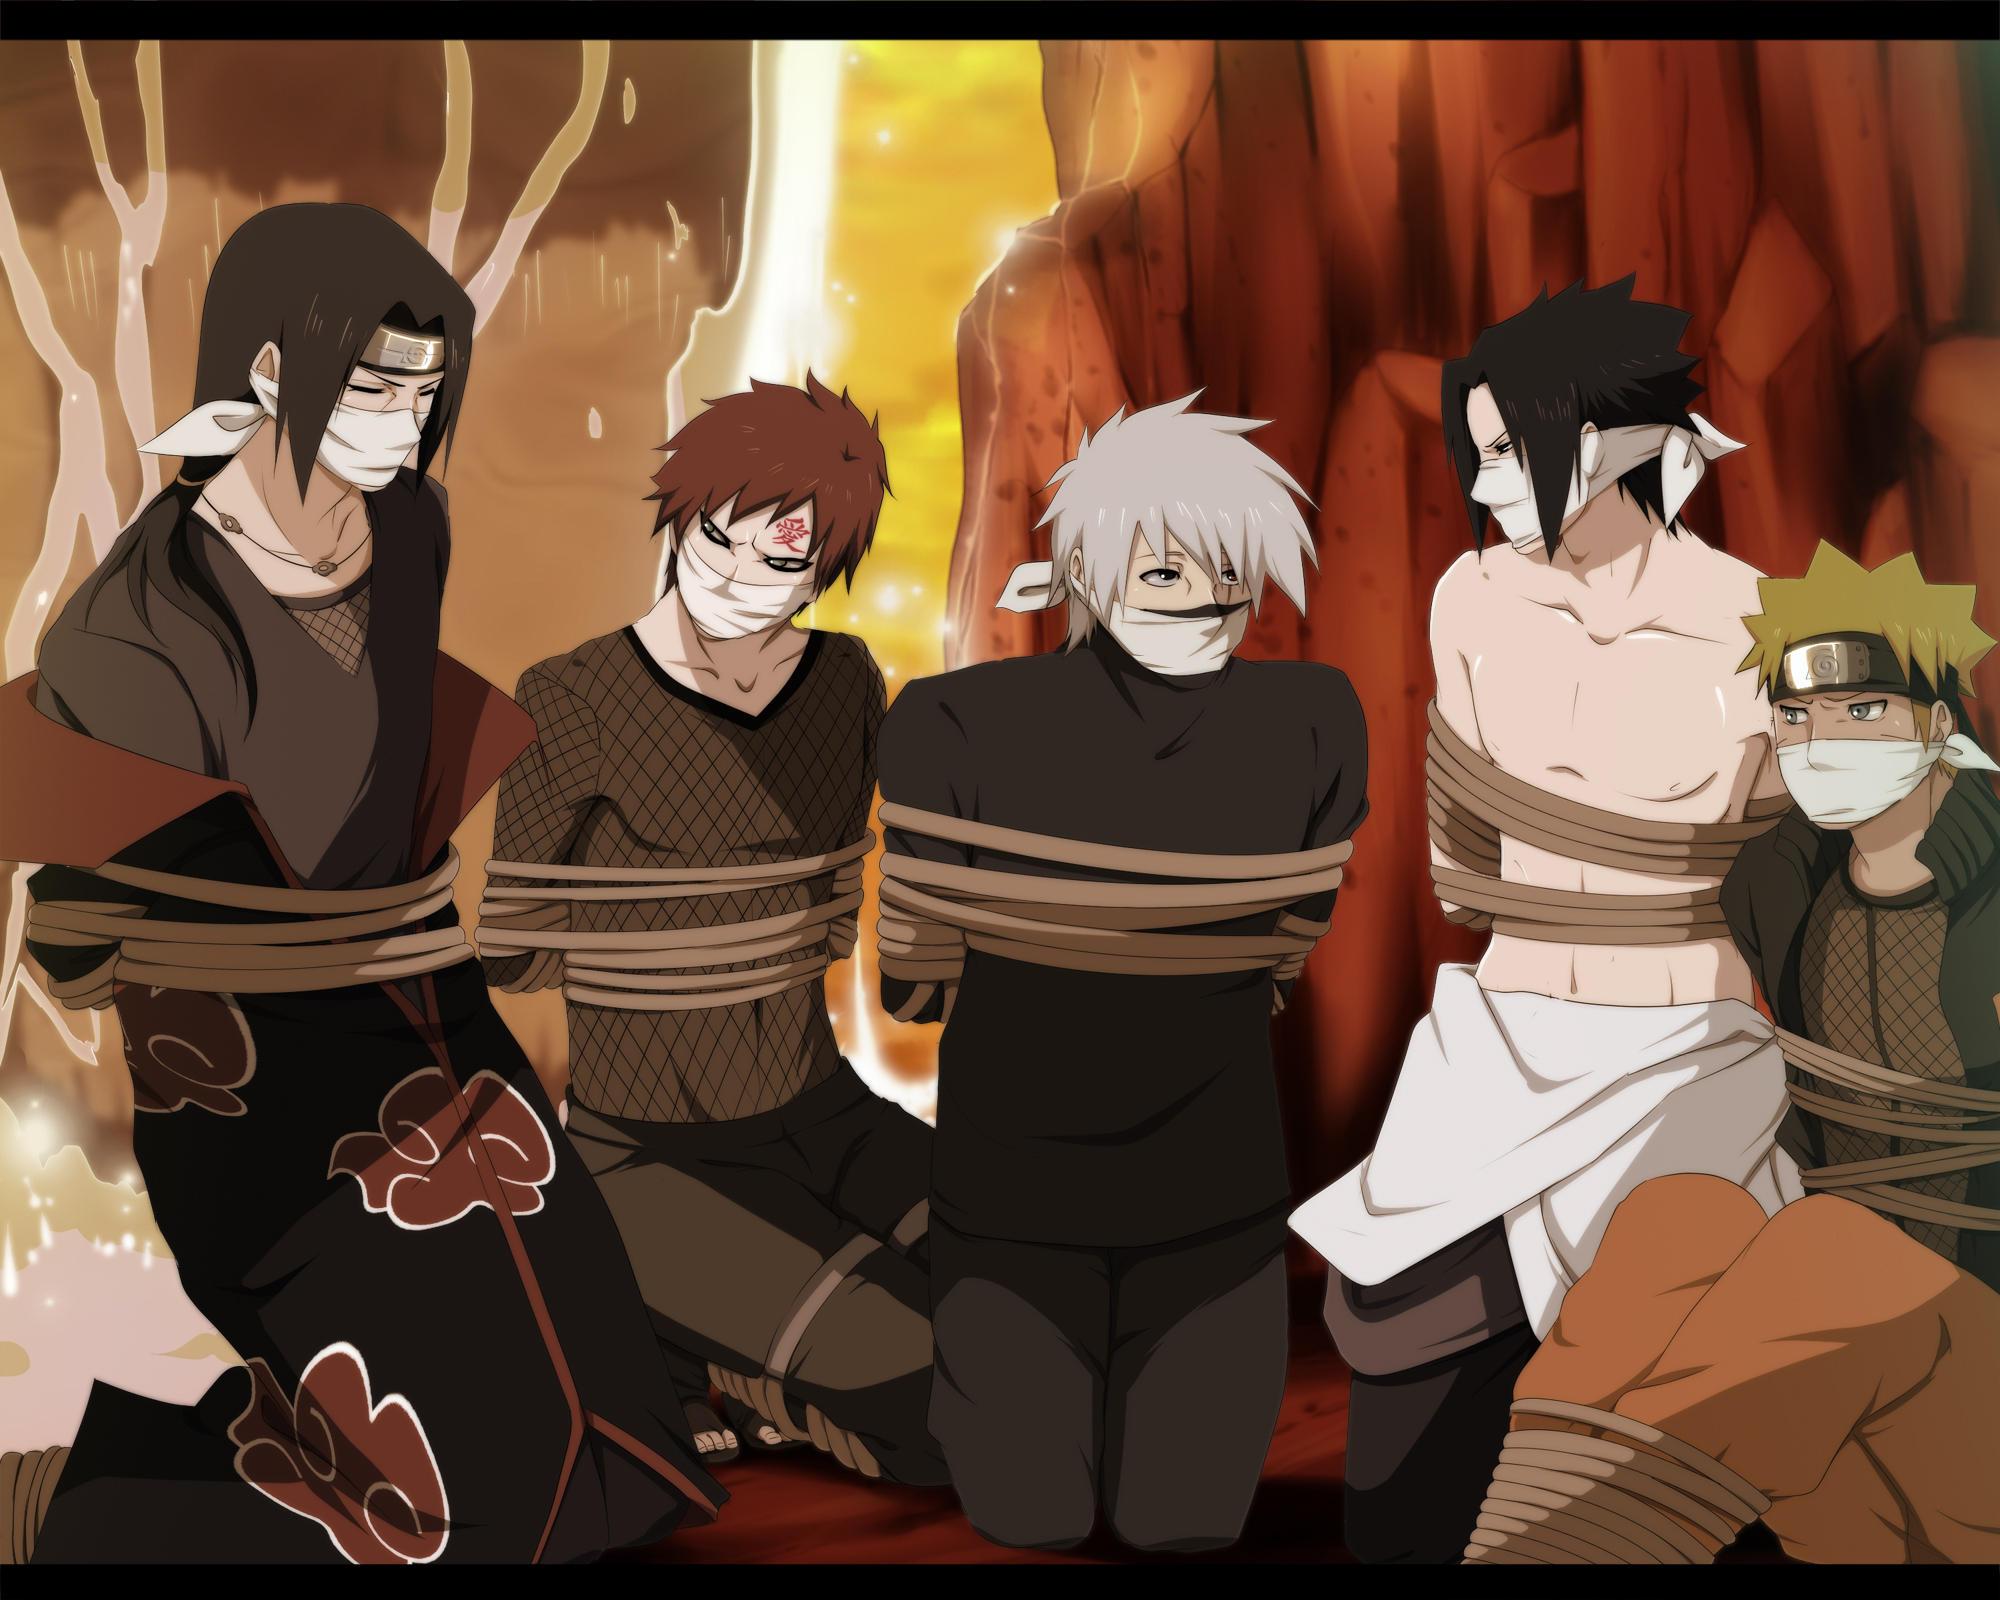 Naruto Wallpaper 2487265 Zerochan Anime Image Board